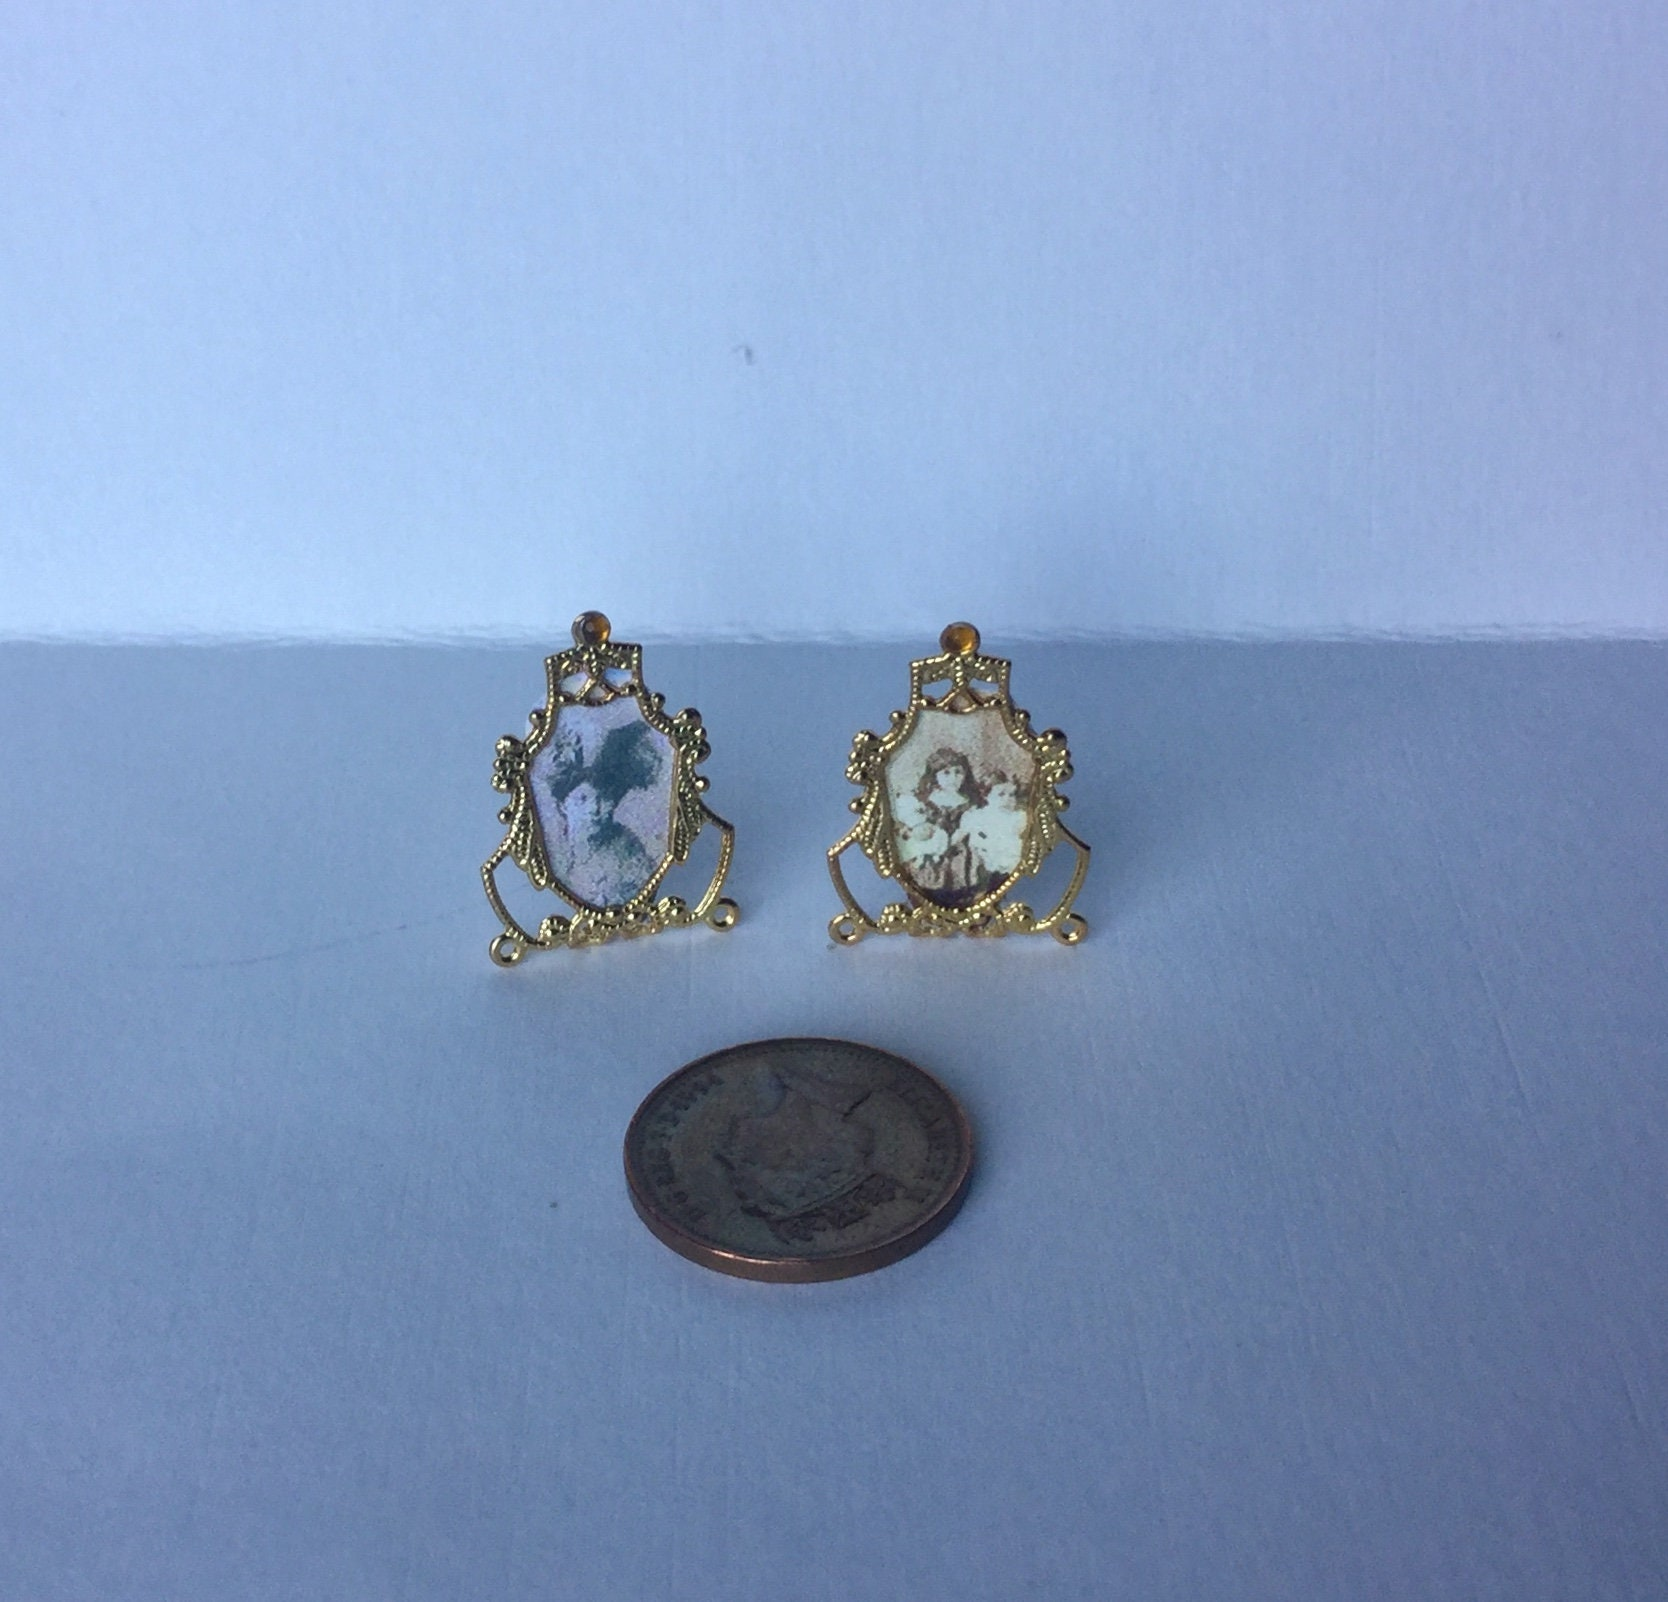 1:12th Skala Puppenhaus Miniatur Deko paar goldfarbene